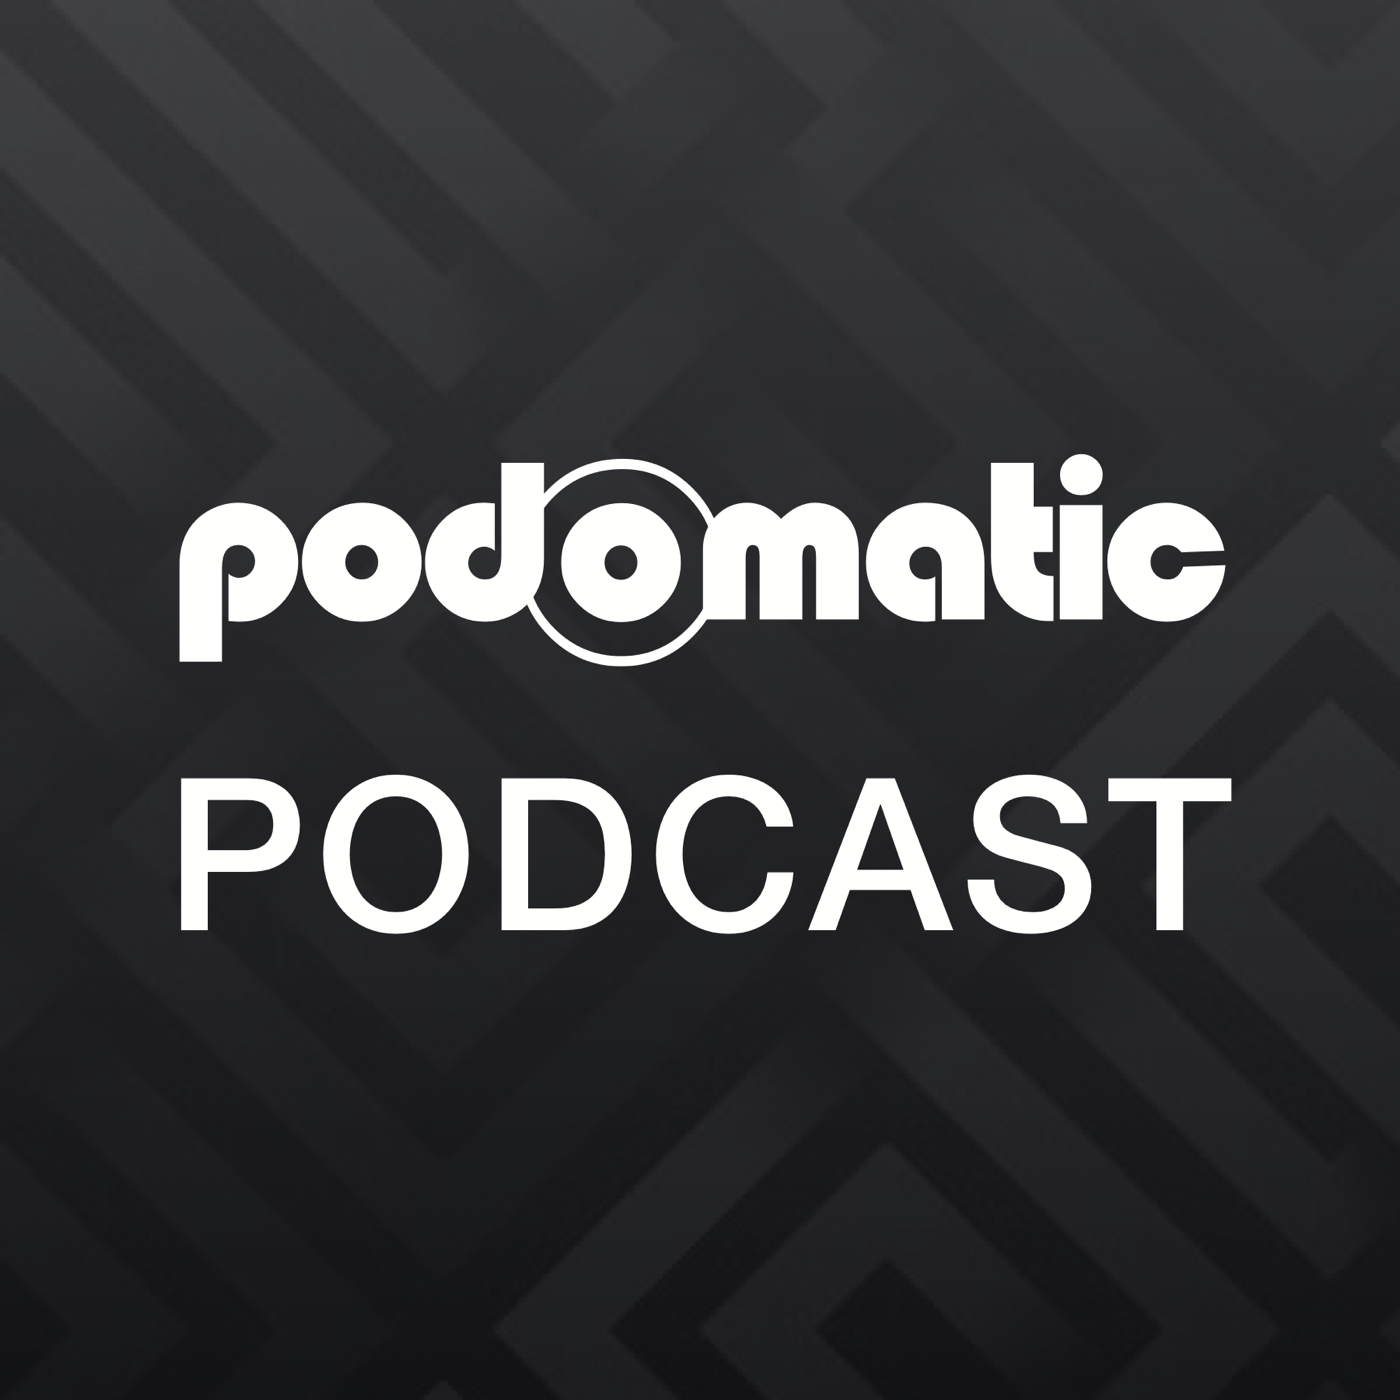 bluemaxxdj (engin-ears)'s Podcast